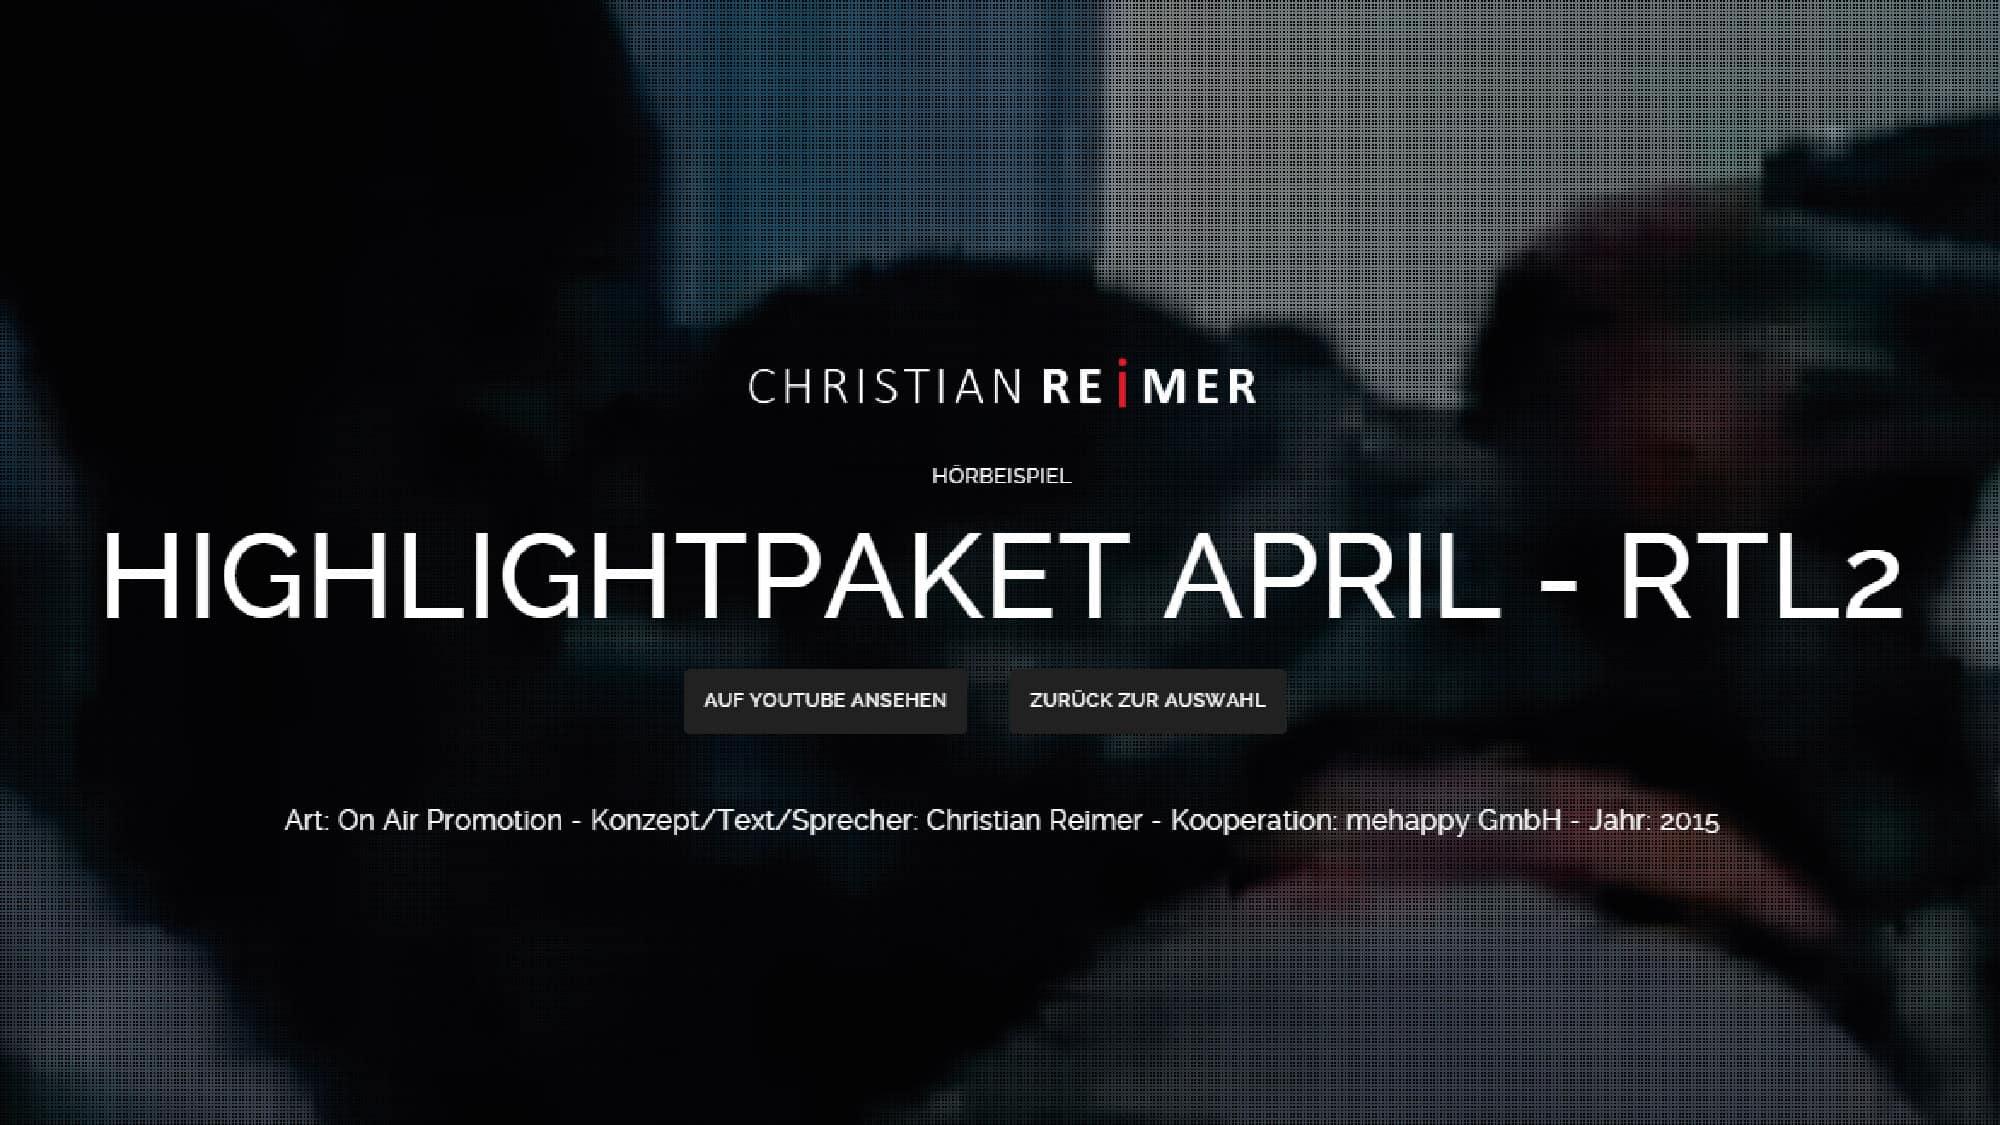 Highlights April RTL2. Gangs of New York. Hörbeispiel Christian Reimer